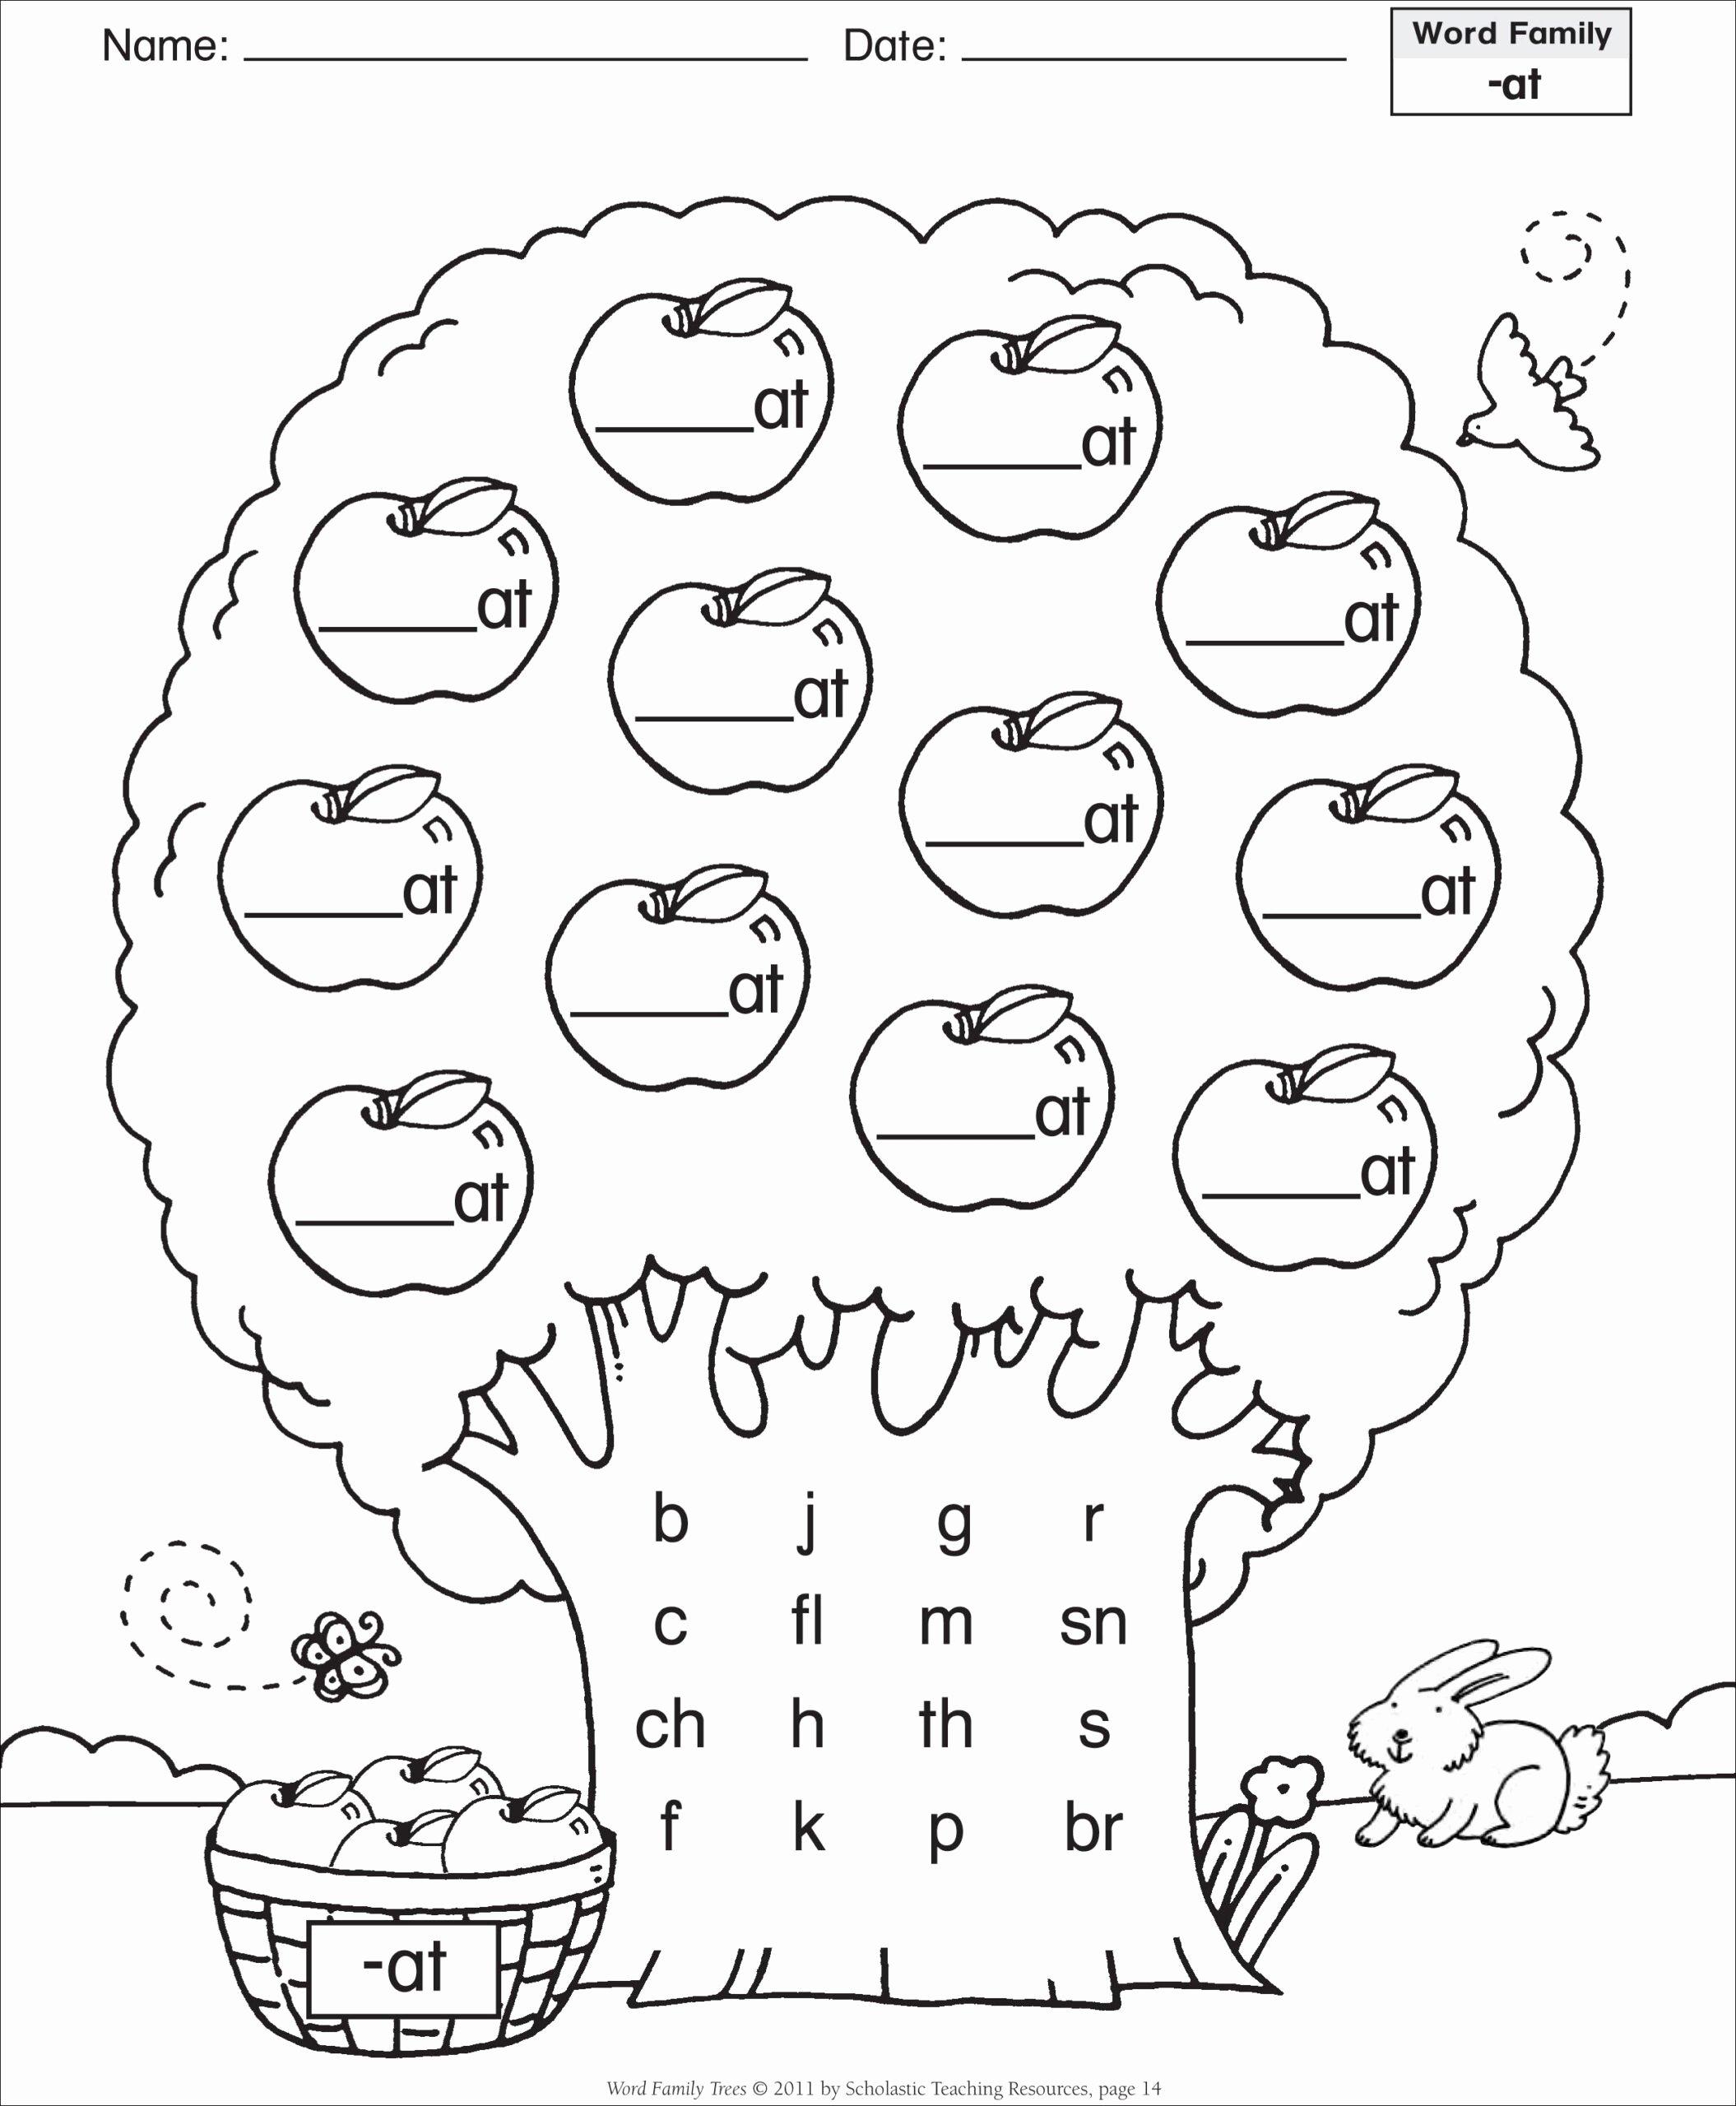 Vowels Worksheets for Preschoolers Printable Worksheets Word Family Template Short Vowel at Tree 4th